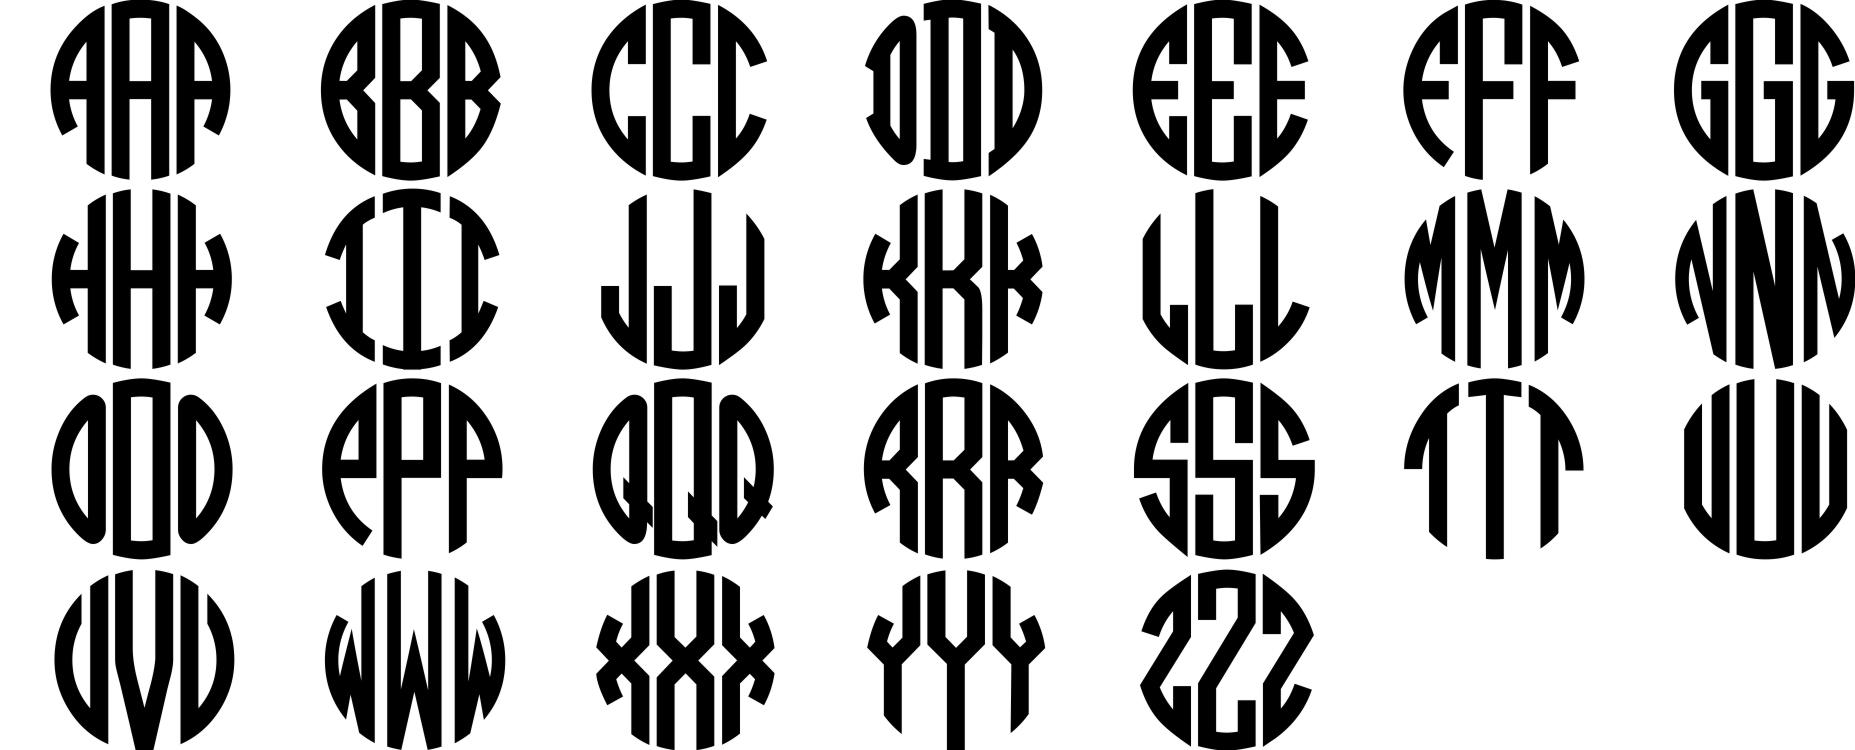 13 Block Monogram Font Images